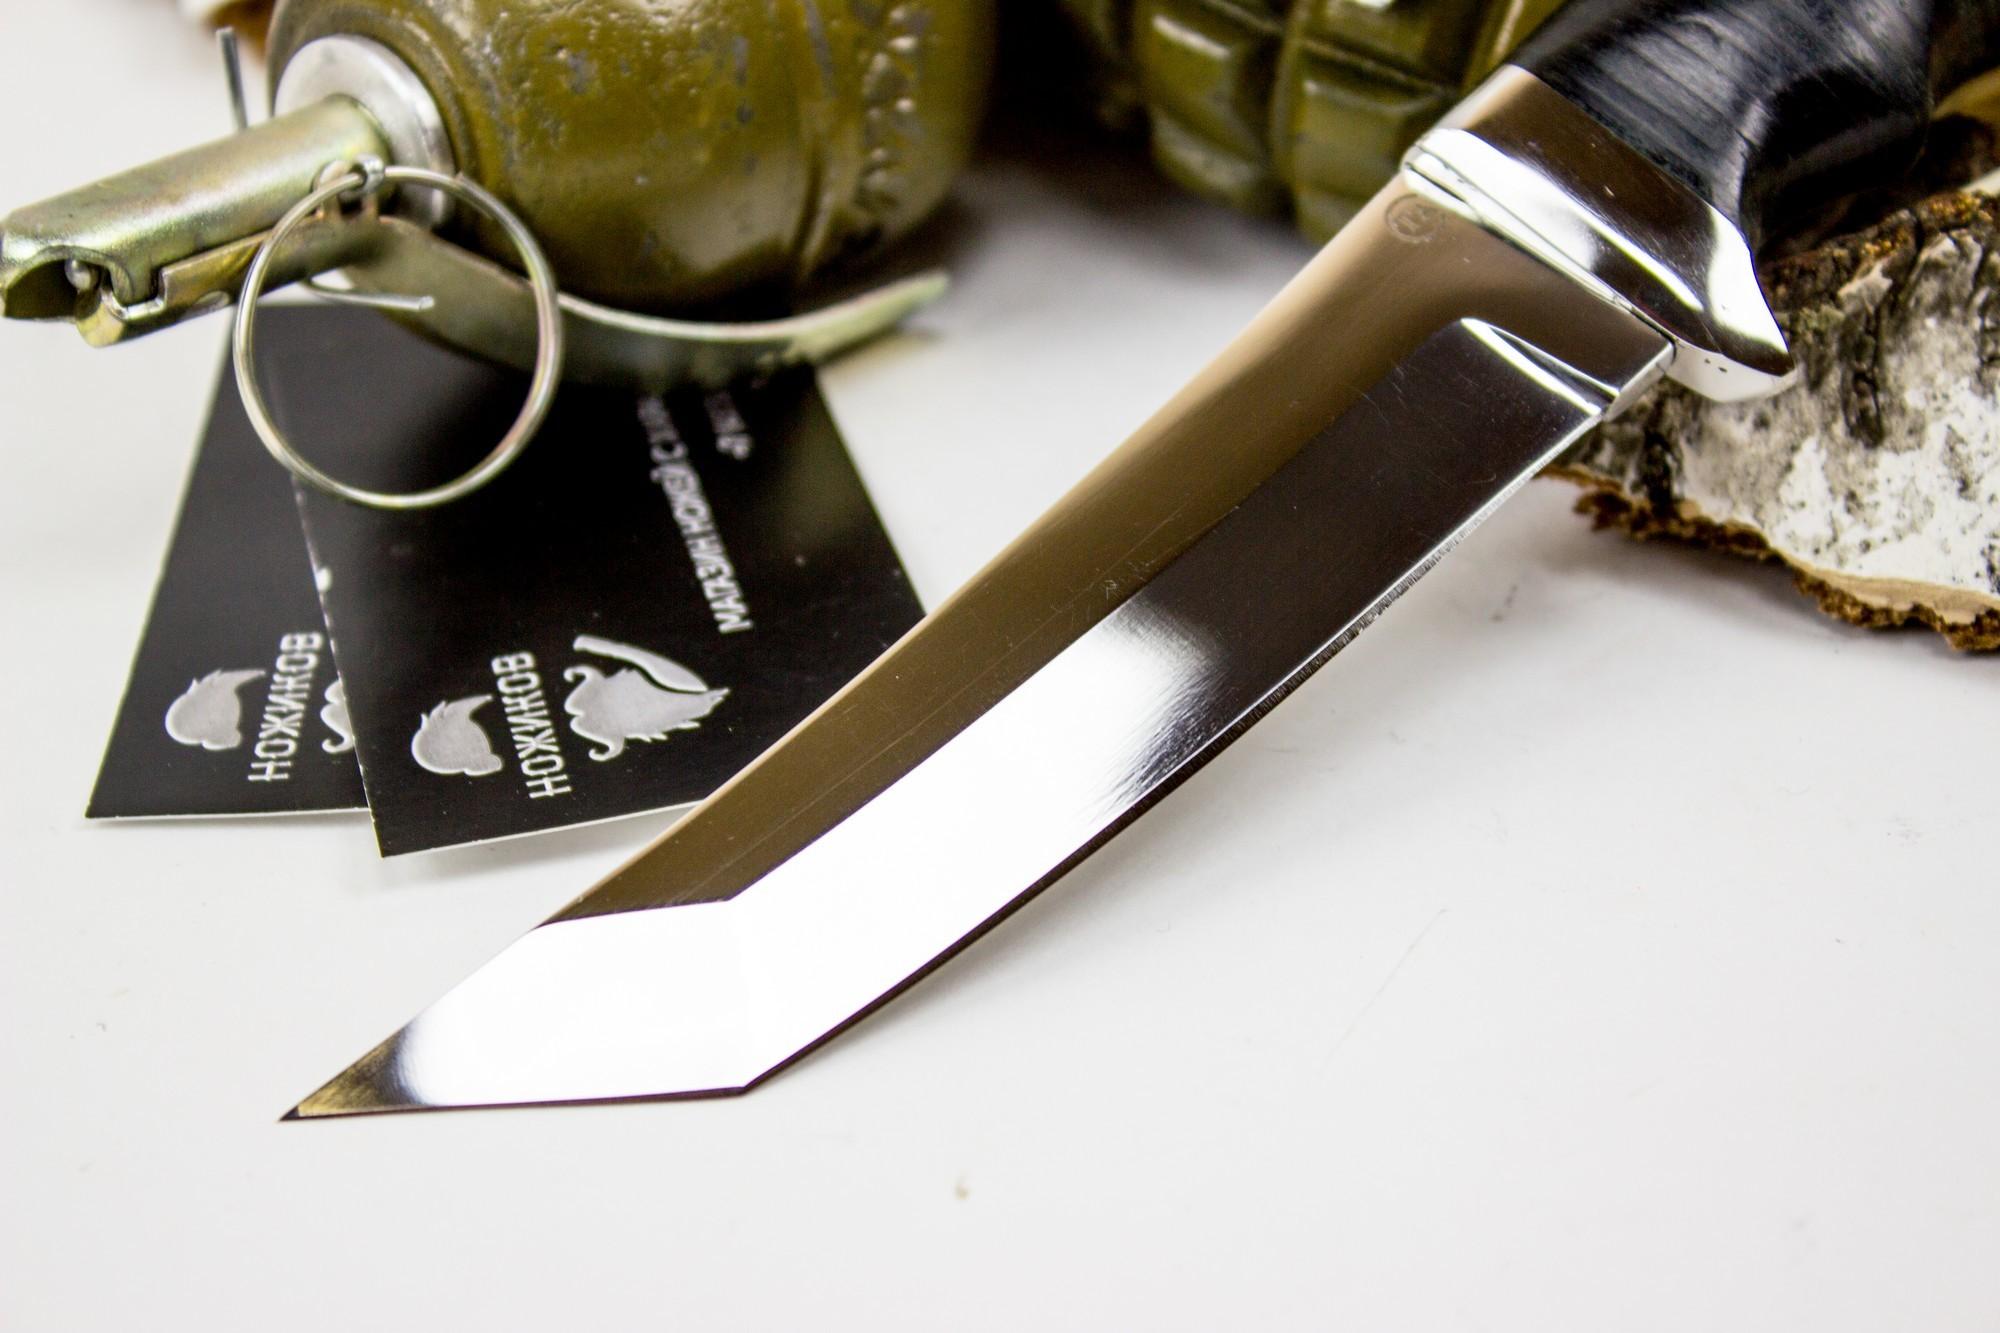 Фото 7 - Нож Аркан, сталь 95х18, кожа от Титов и Солдатова